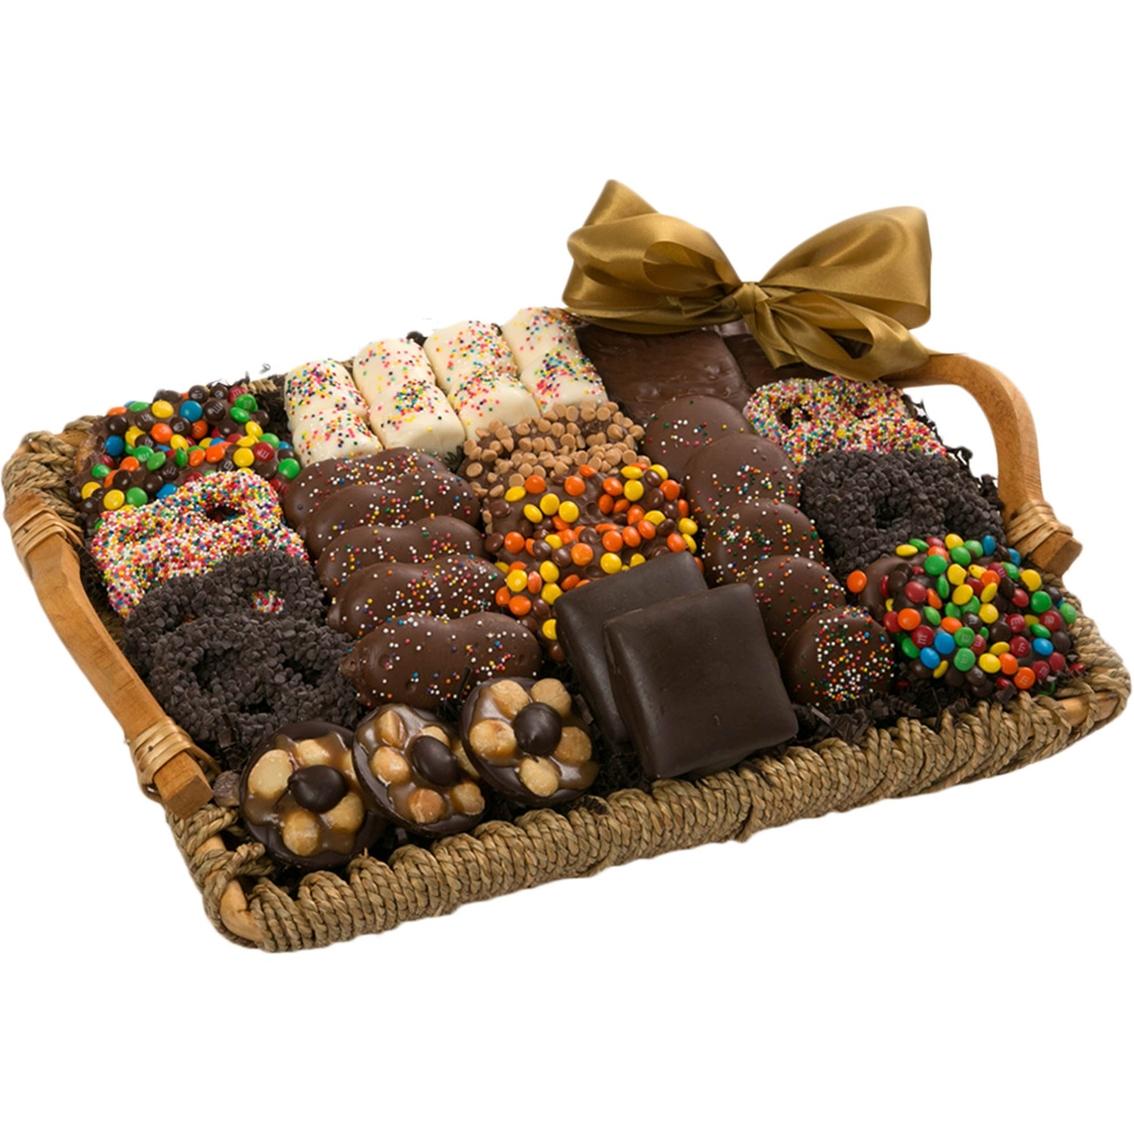 Chocolate Works Chocolate Tray Gift Basket   Sweets & Chocolate ...